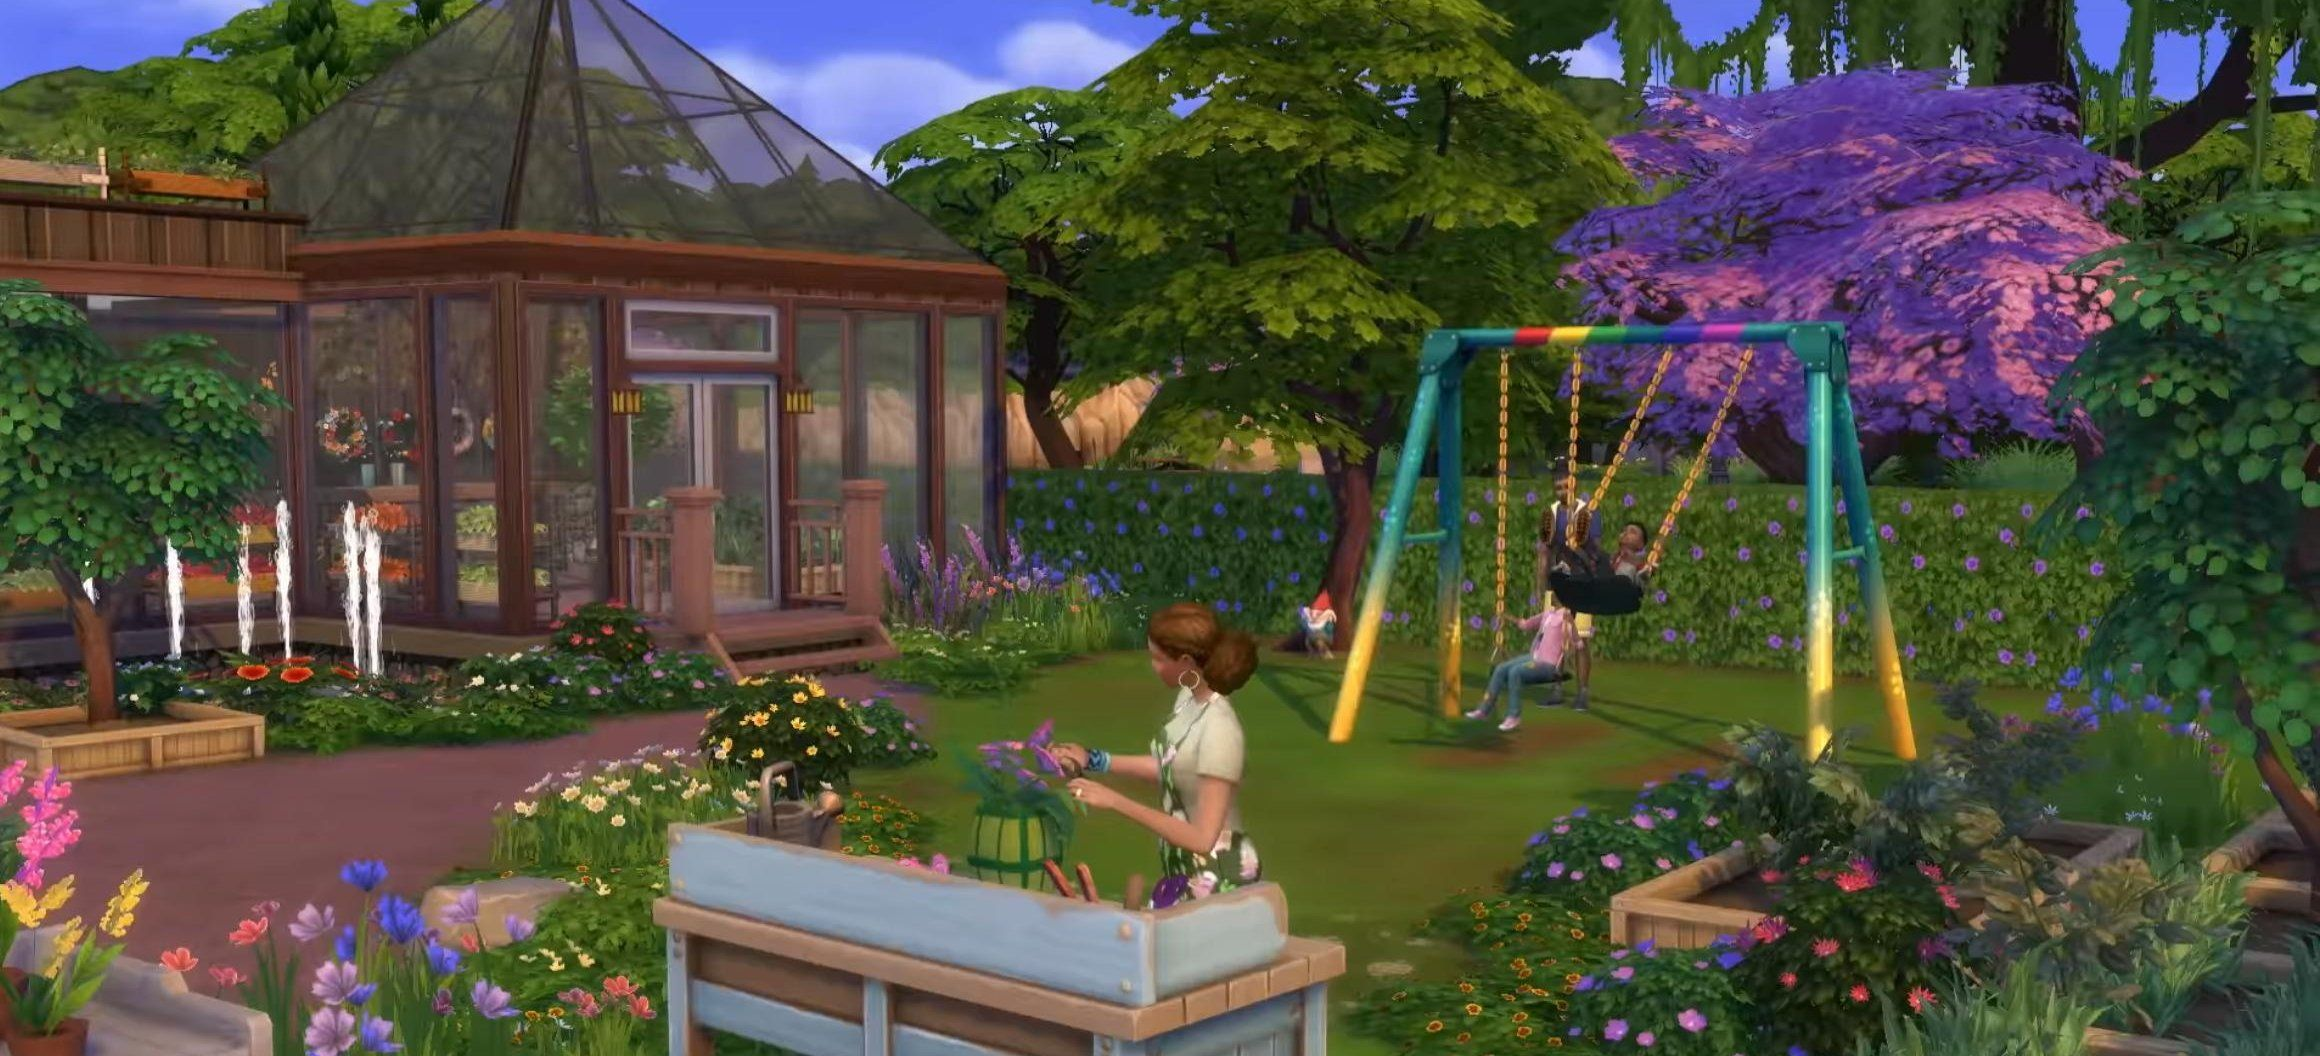 Sims 6: 6 Of The Best Things Gardeners Do  TheGamer